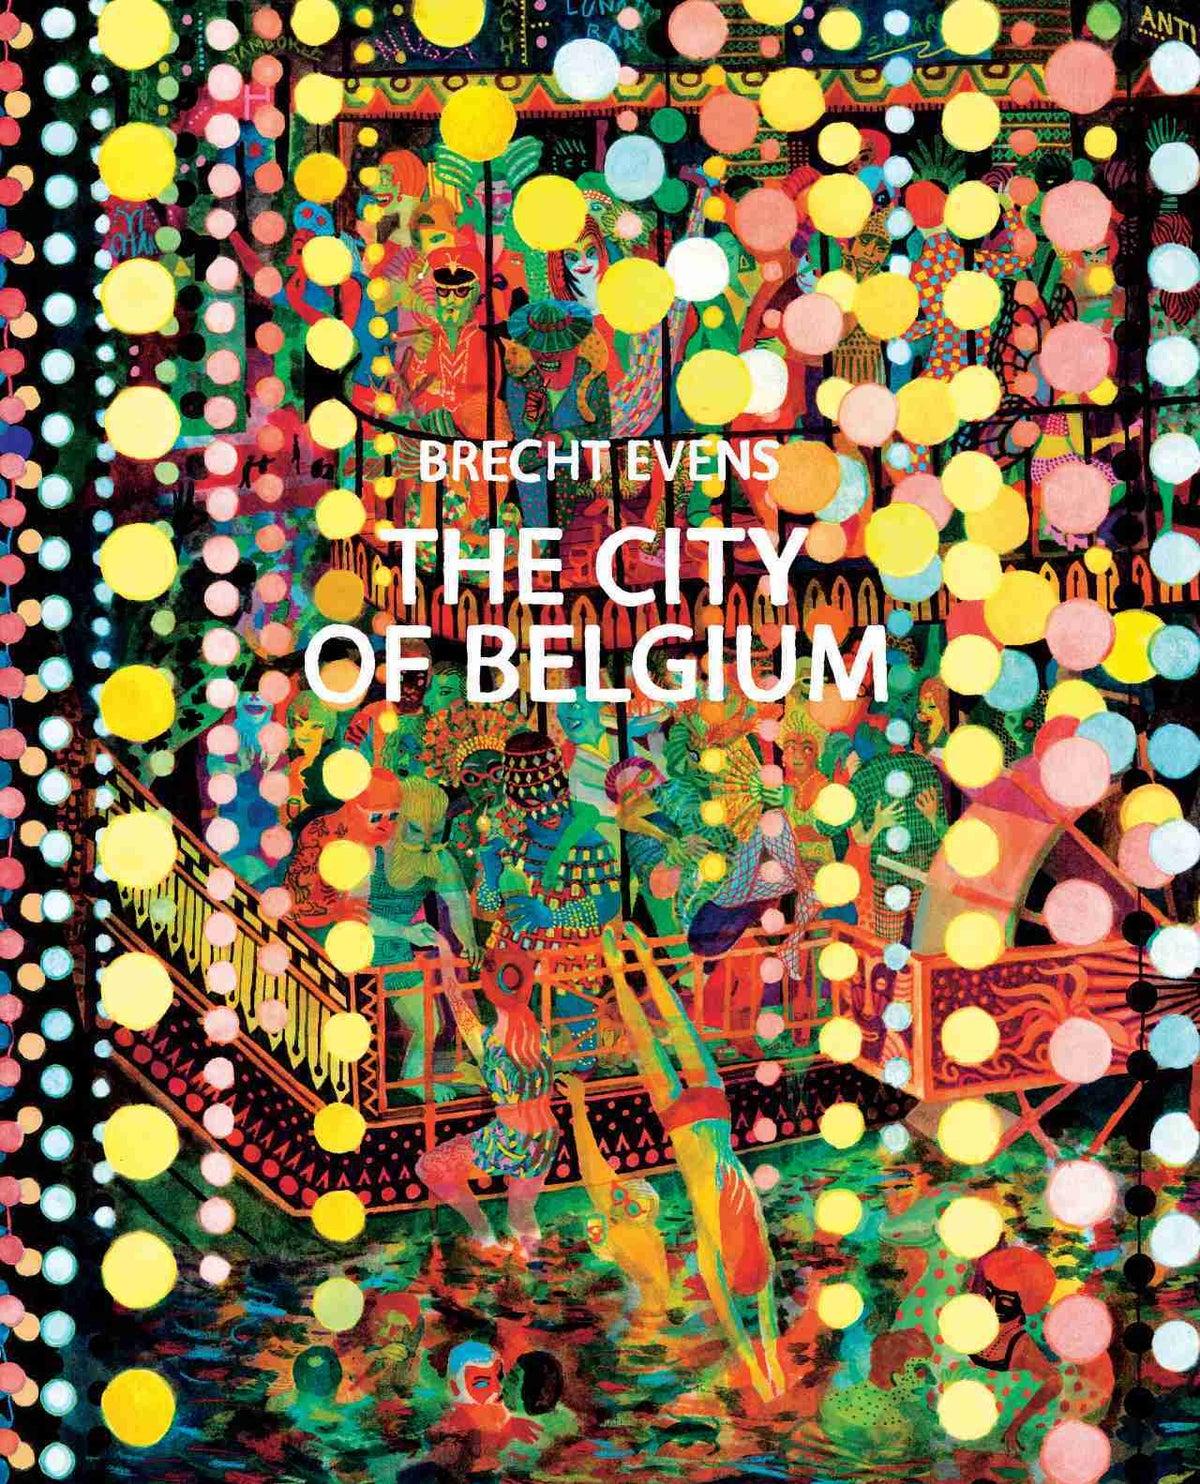 The City of Belgium